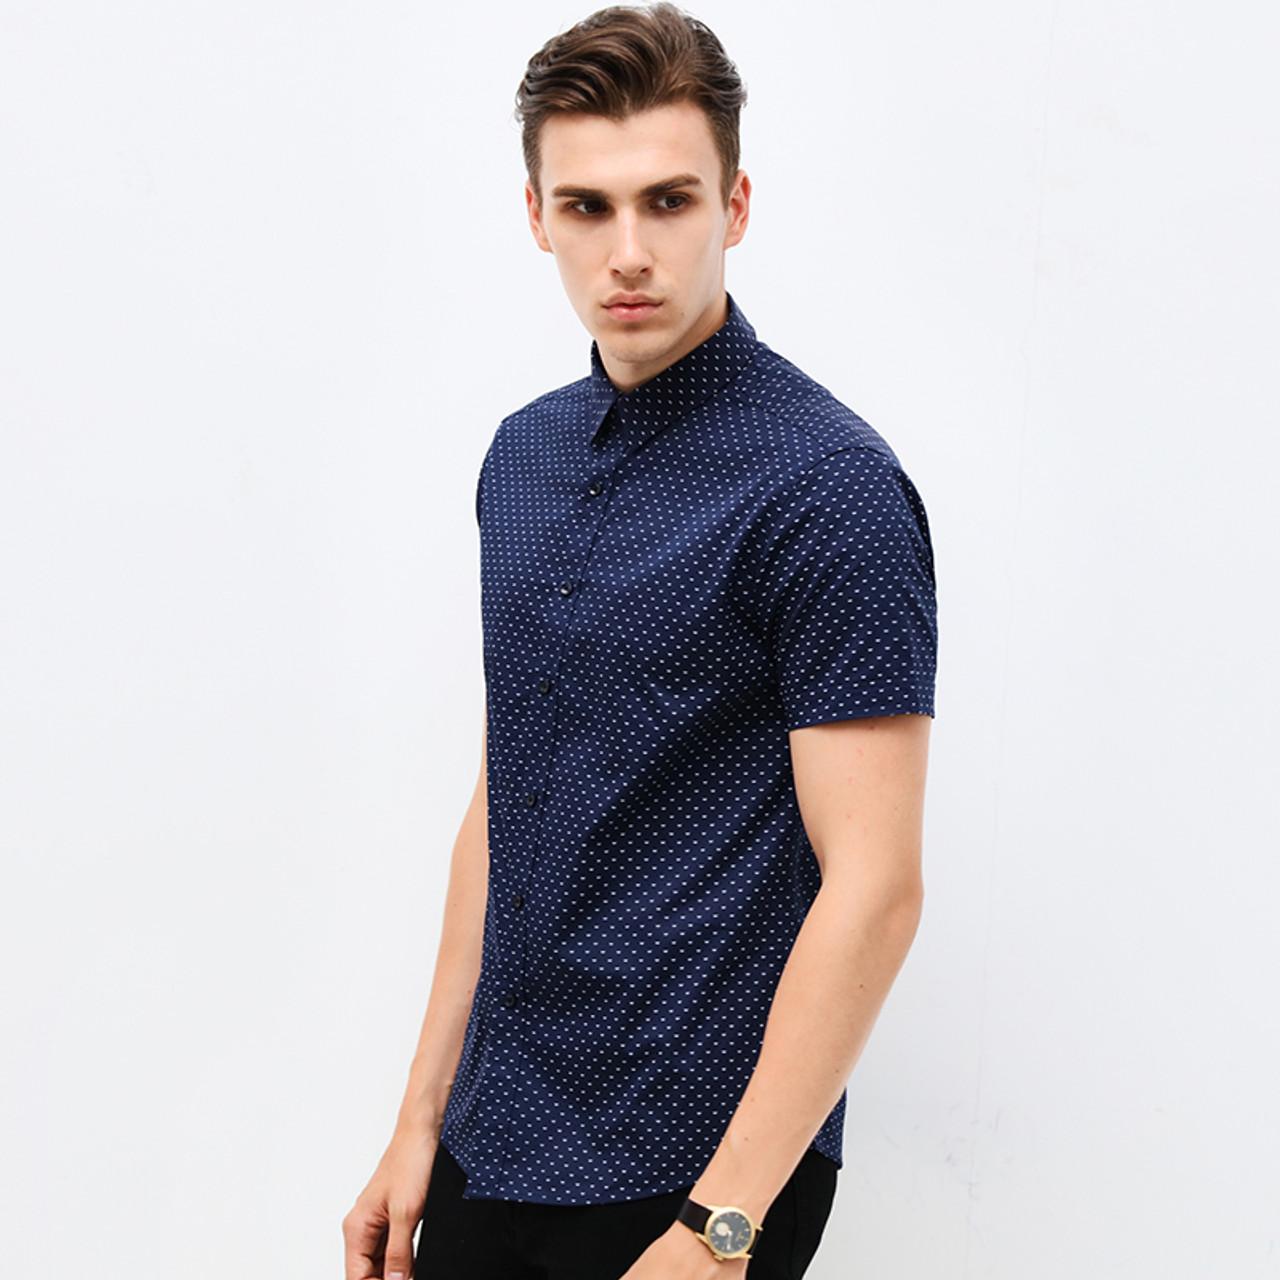 c1456a9f6f2 ... Hot 2018 Summer New Fashion Brand Clothing Men Short Sleeve Shirt Polka  Dot Slim Fit Shirt ...